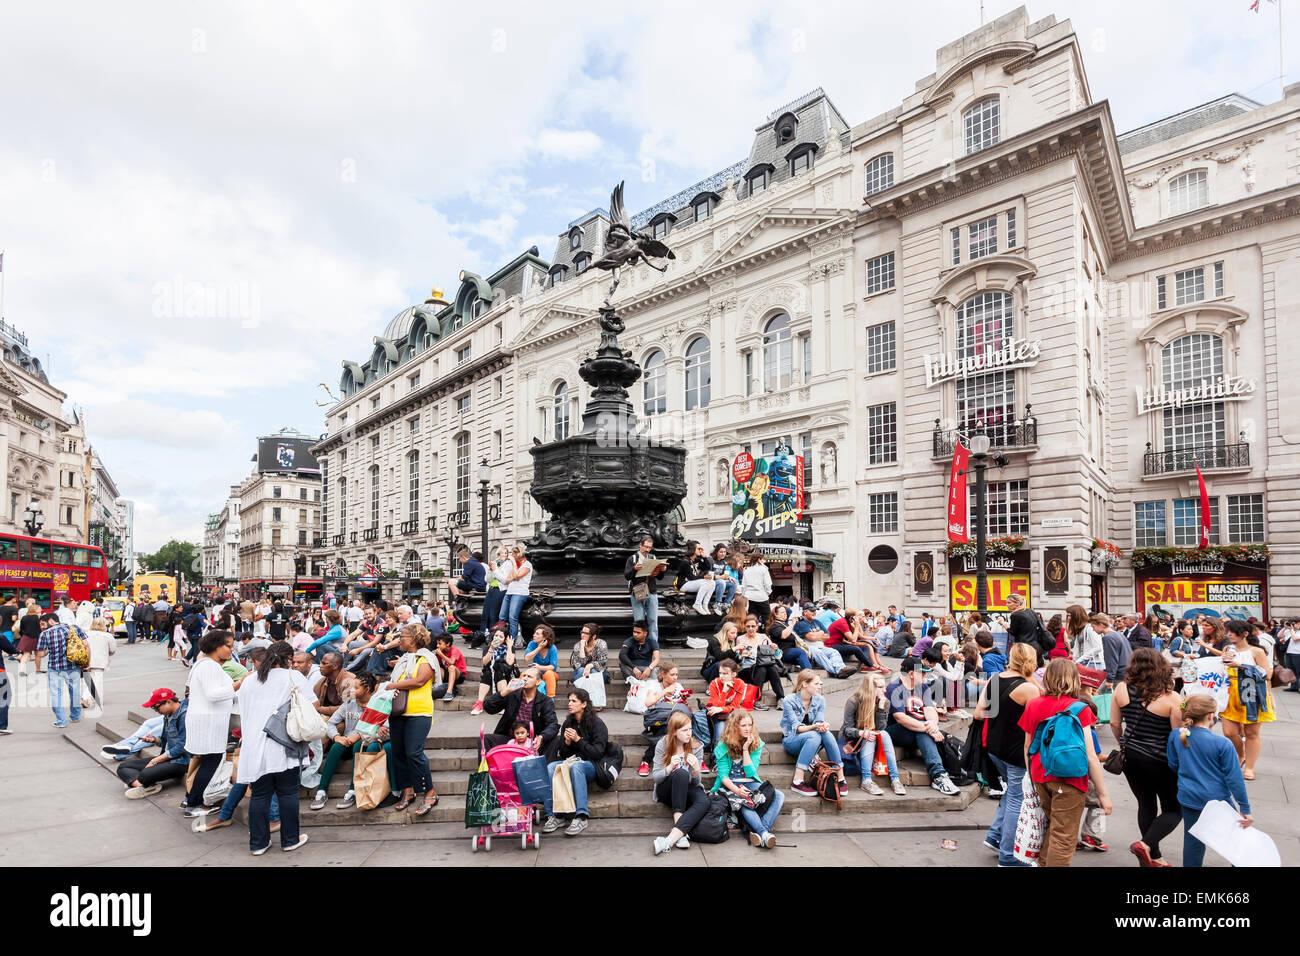 Piccadilly Circus, London, England, United Kingdom - Stock Image